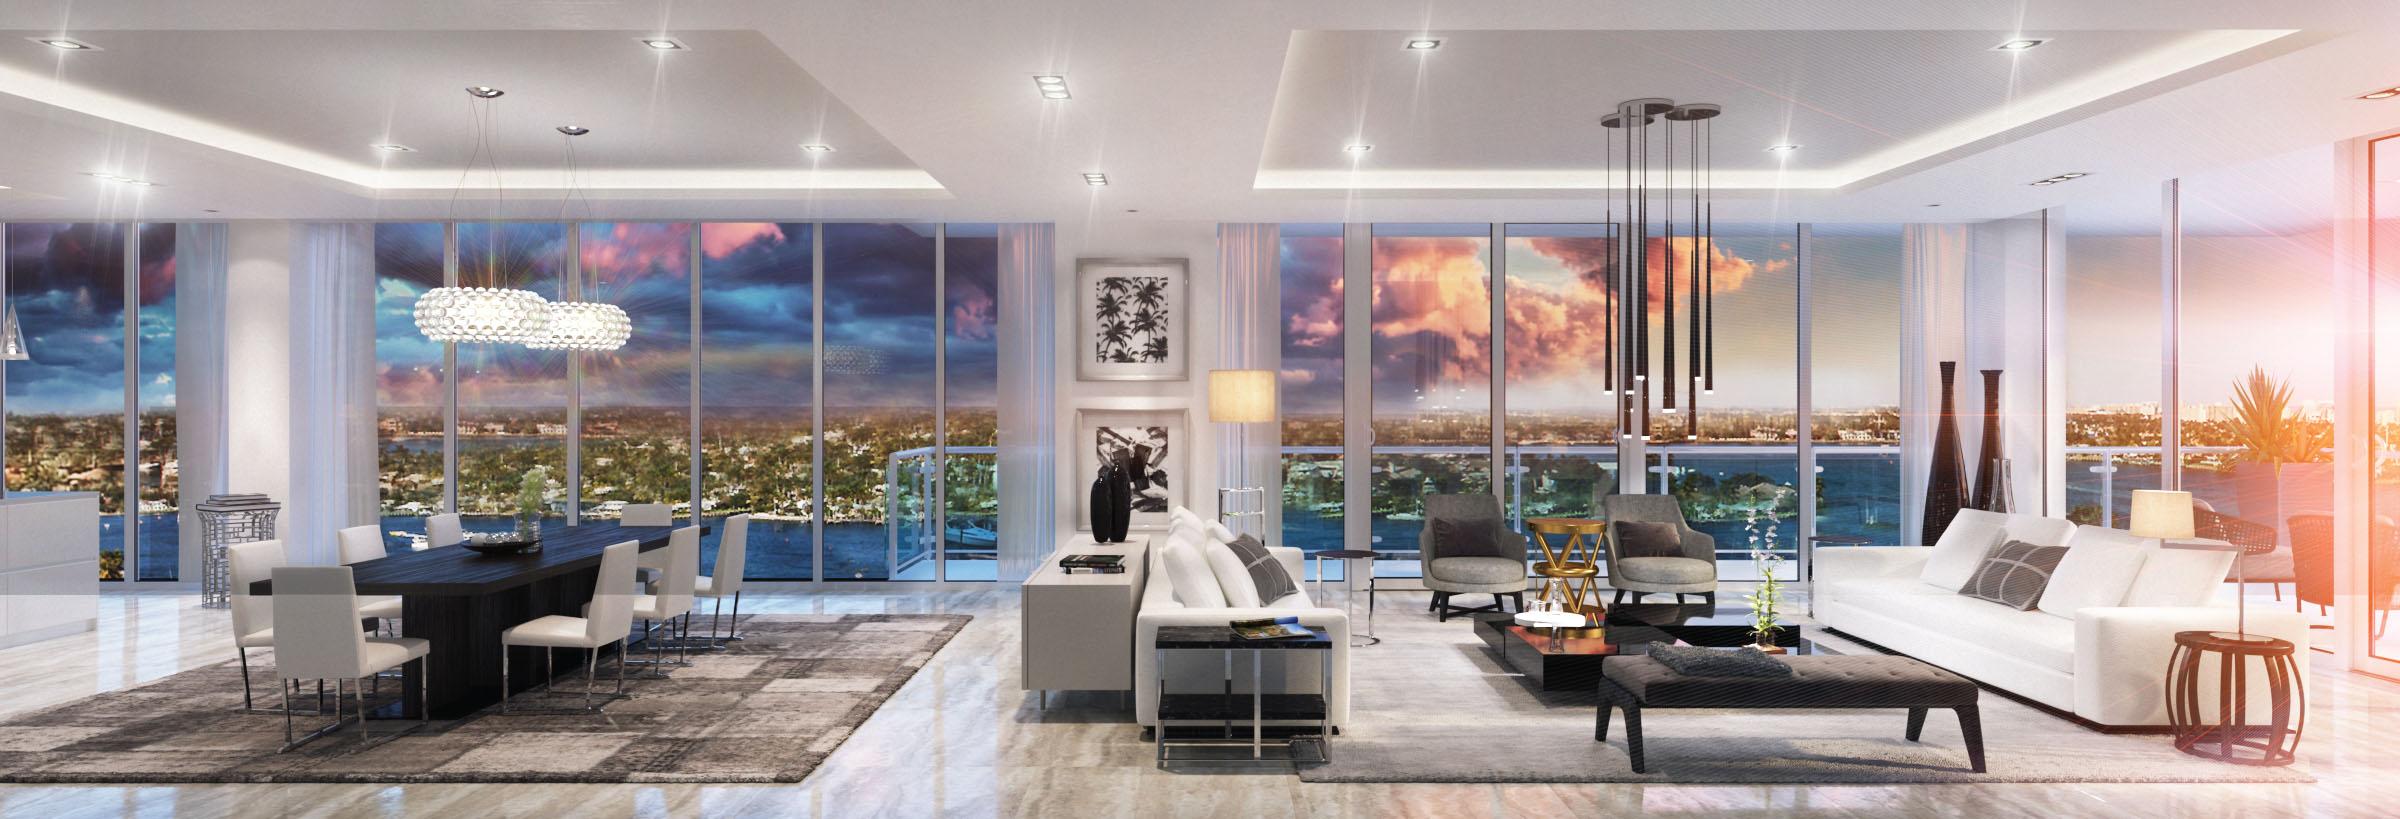 S Andrews Avenue Room  Fort Lauderdale Fl